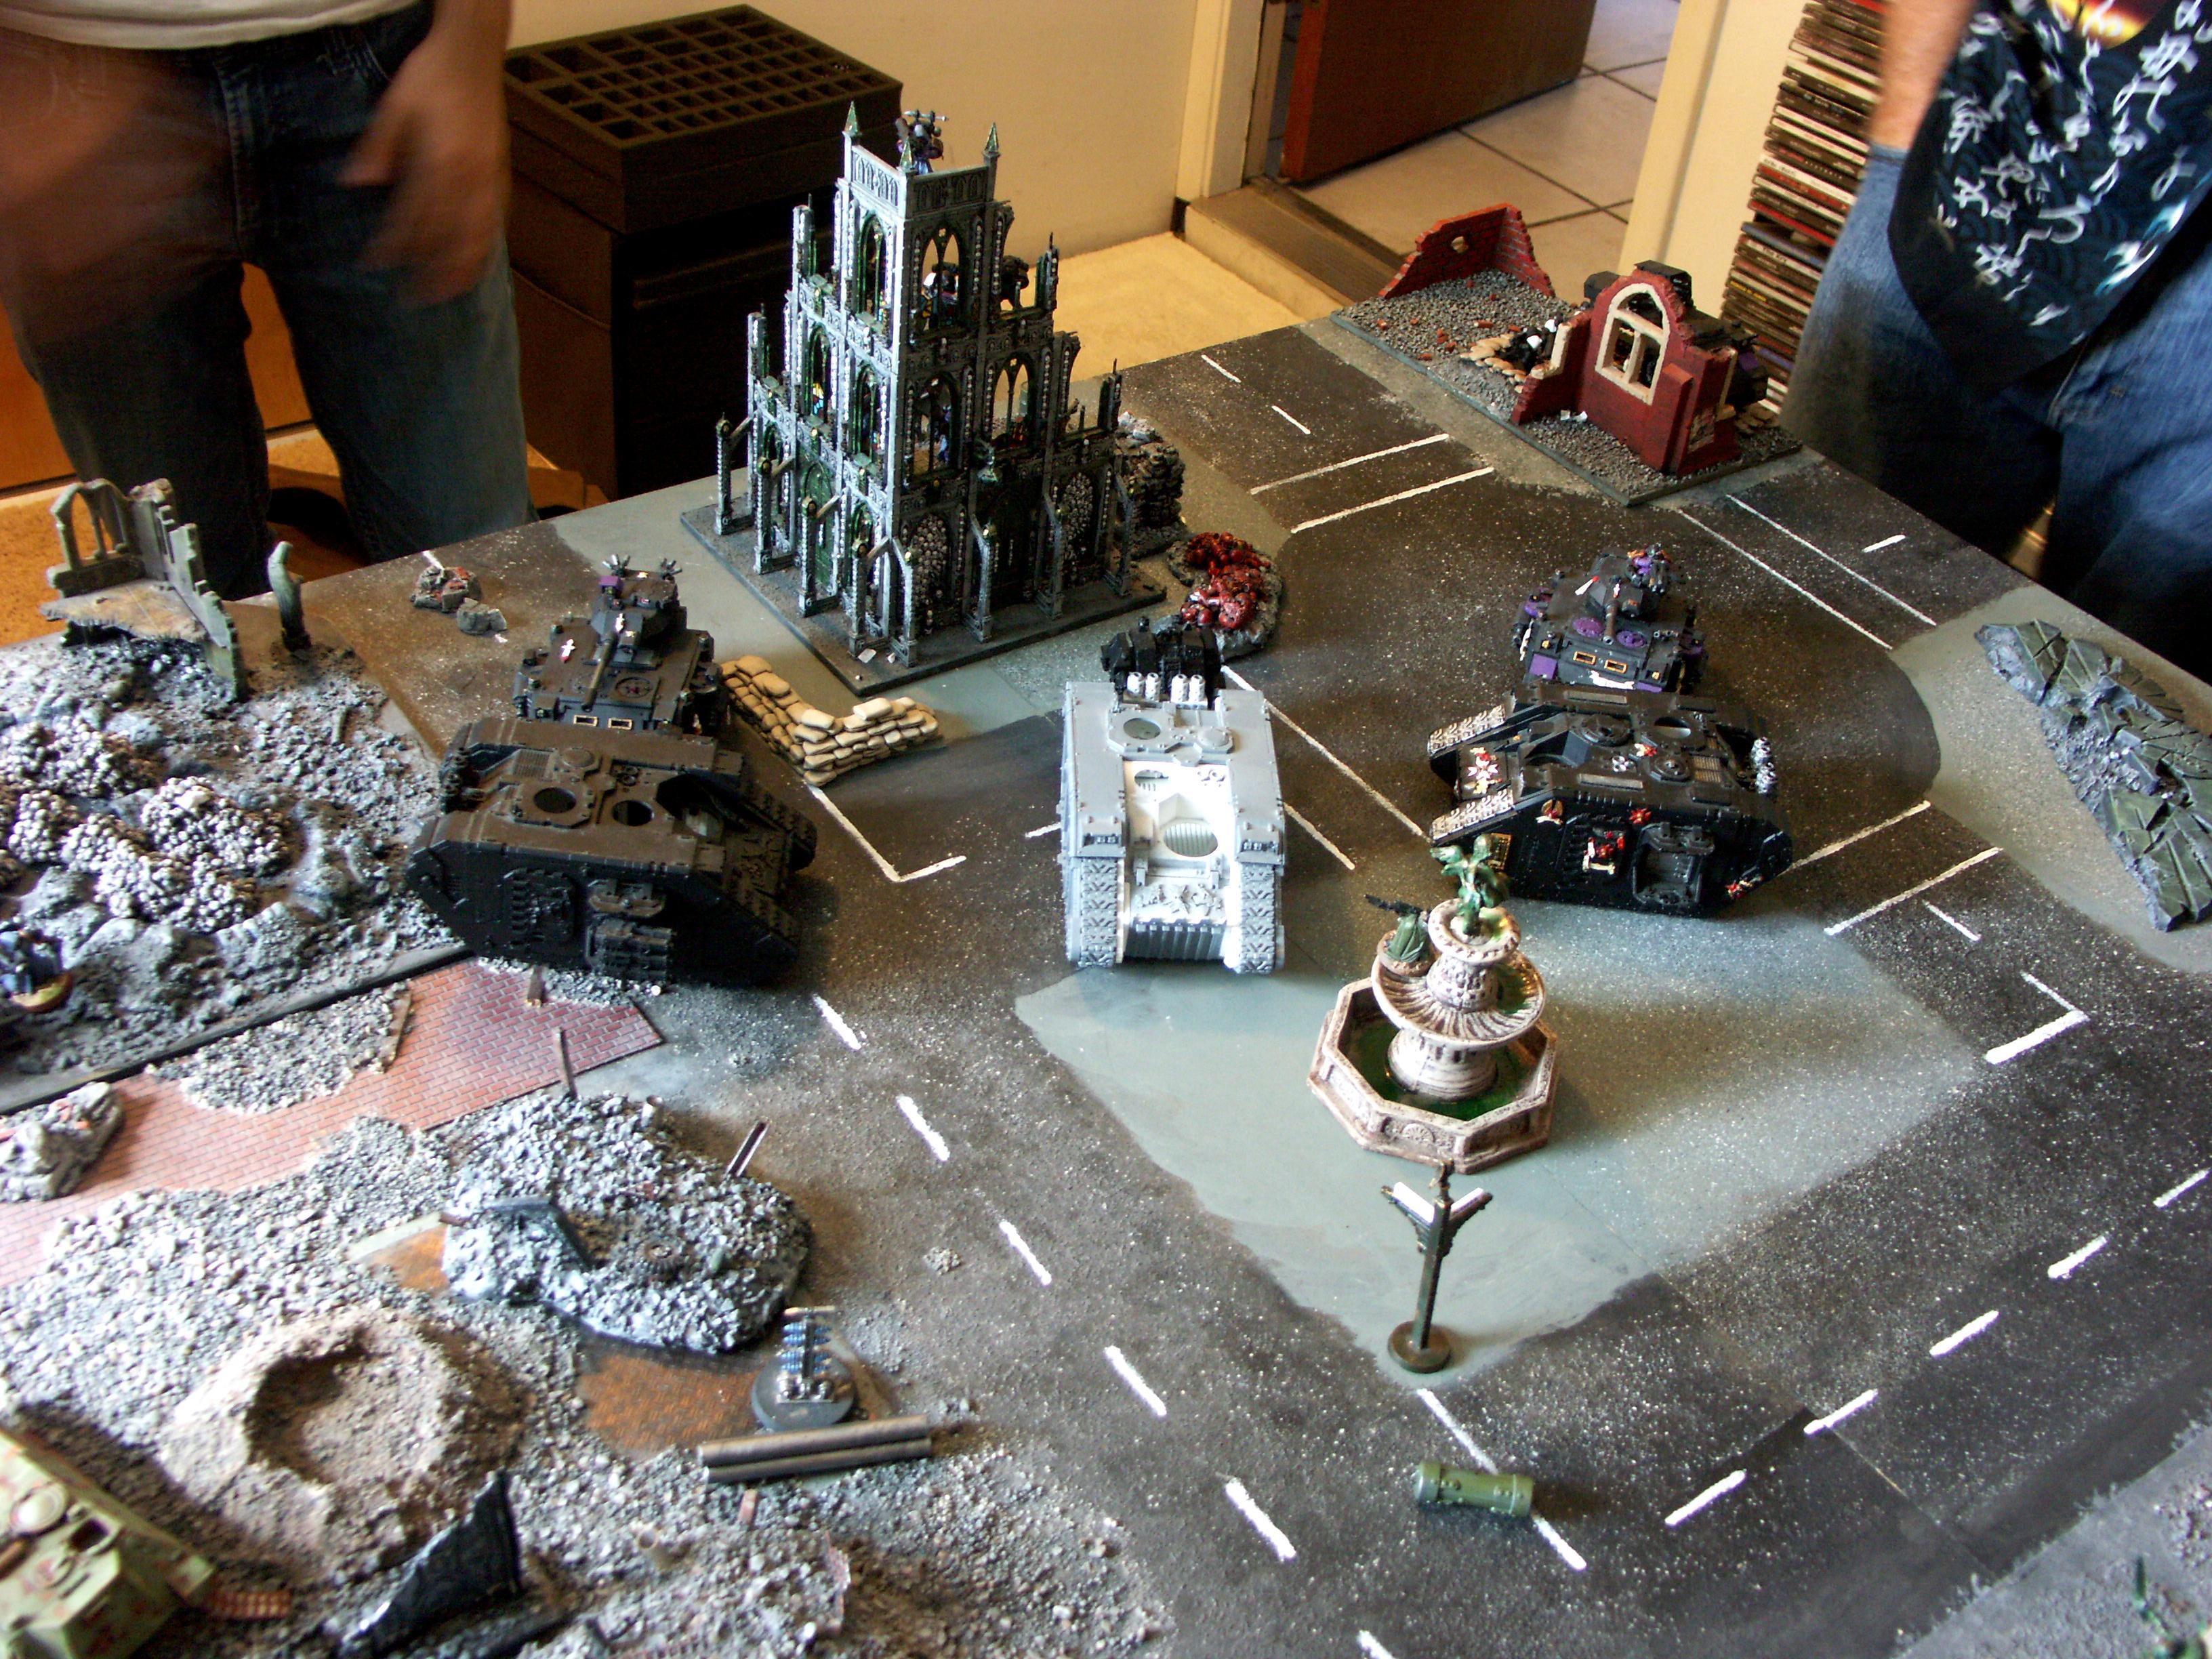 Apocalypse, Battle, Battle Report, Black Templars, Chaos, Chaos Space Marines, Dark Eldar, De, Imperial Guard, Orks, Space Marines, Space Wolves